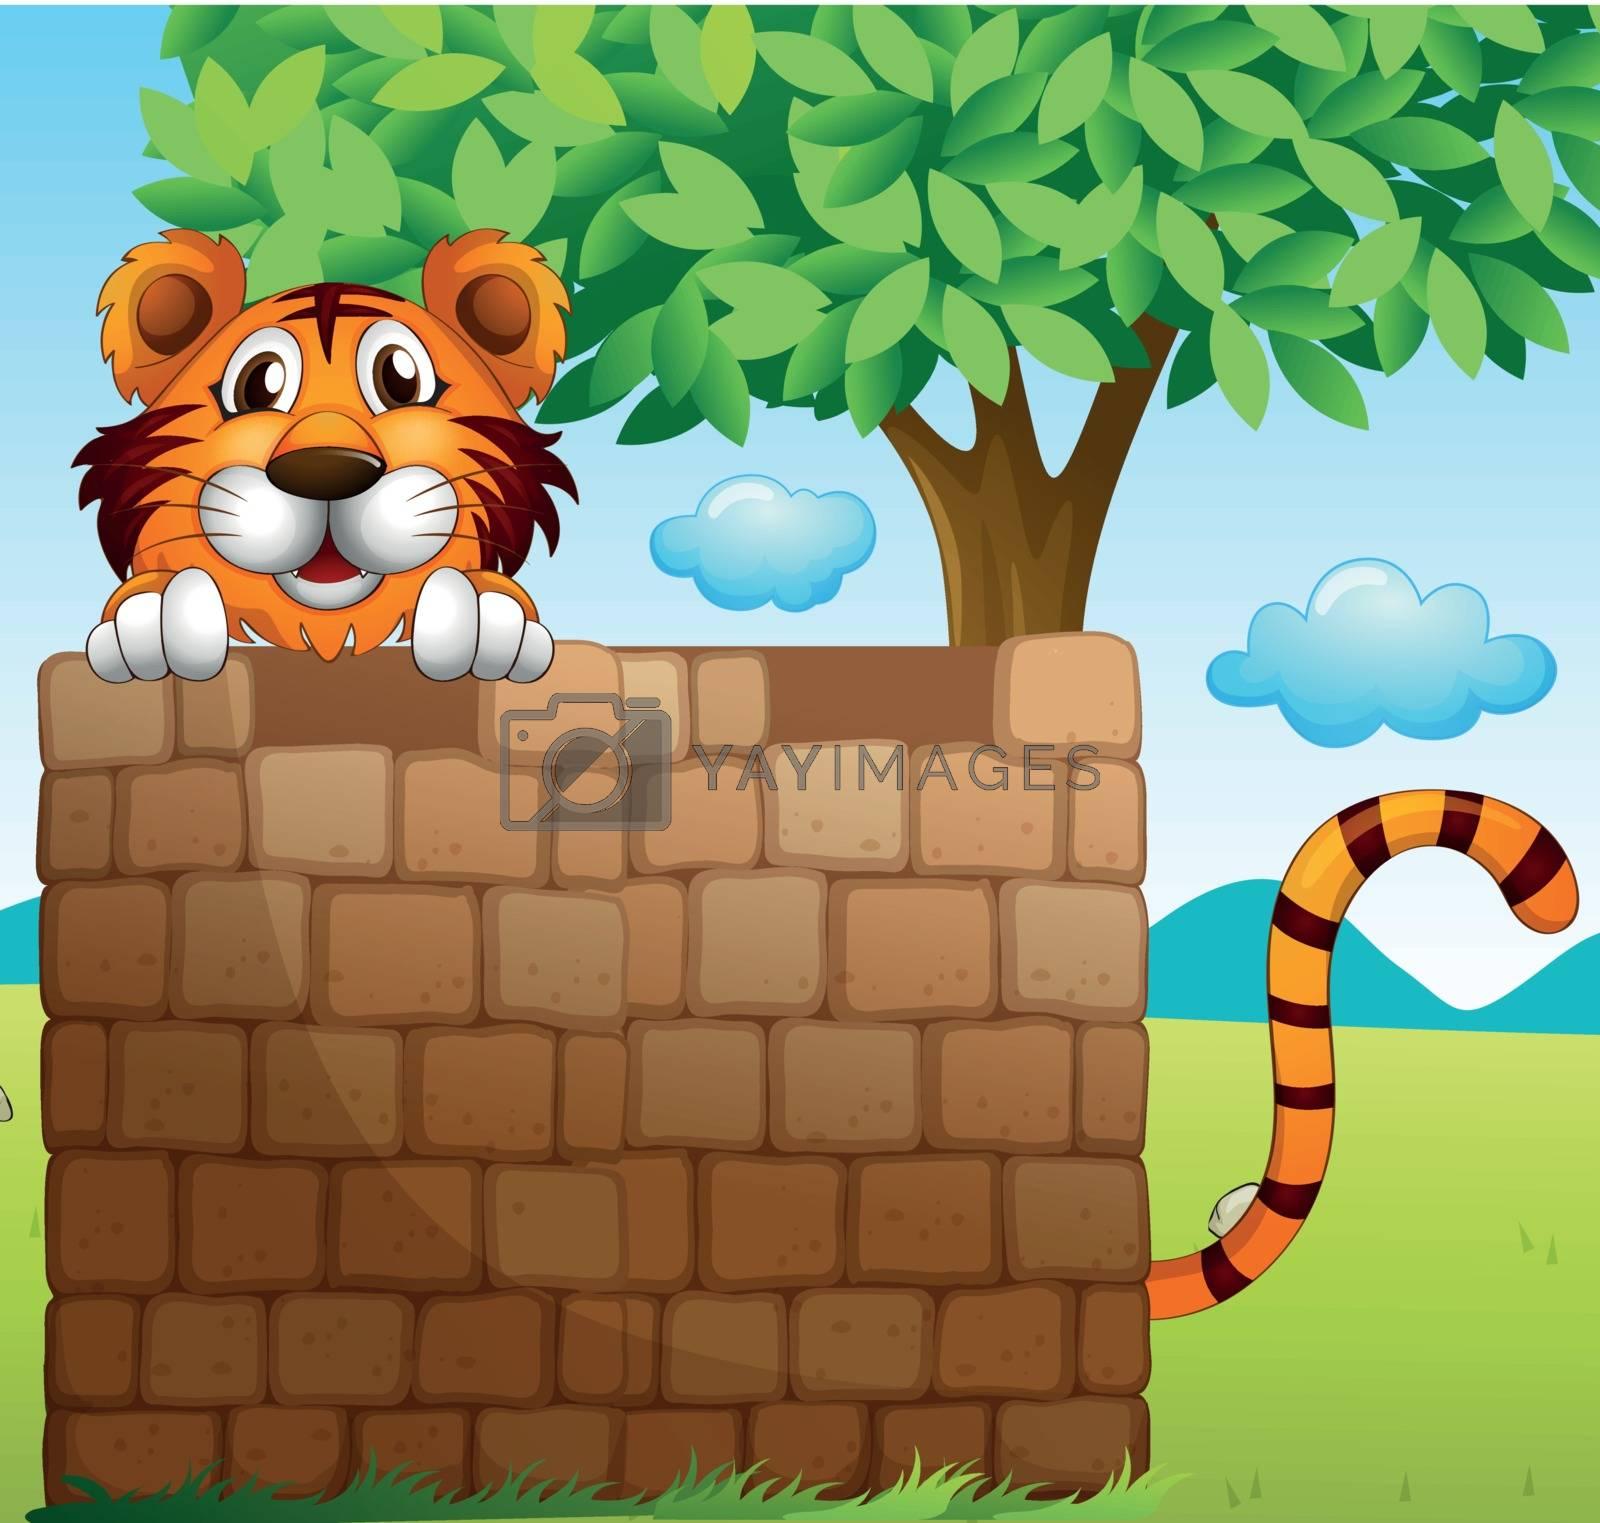 Illustration of a tiger hiding on a pile of bricks